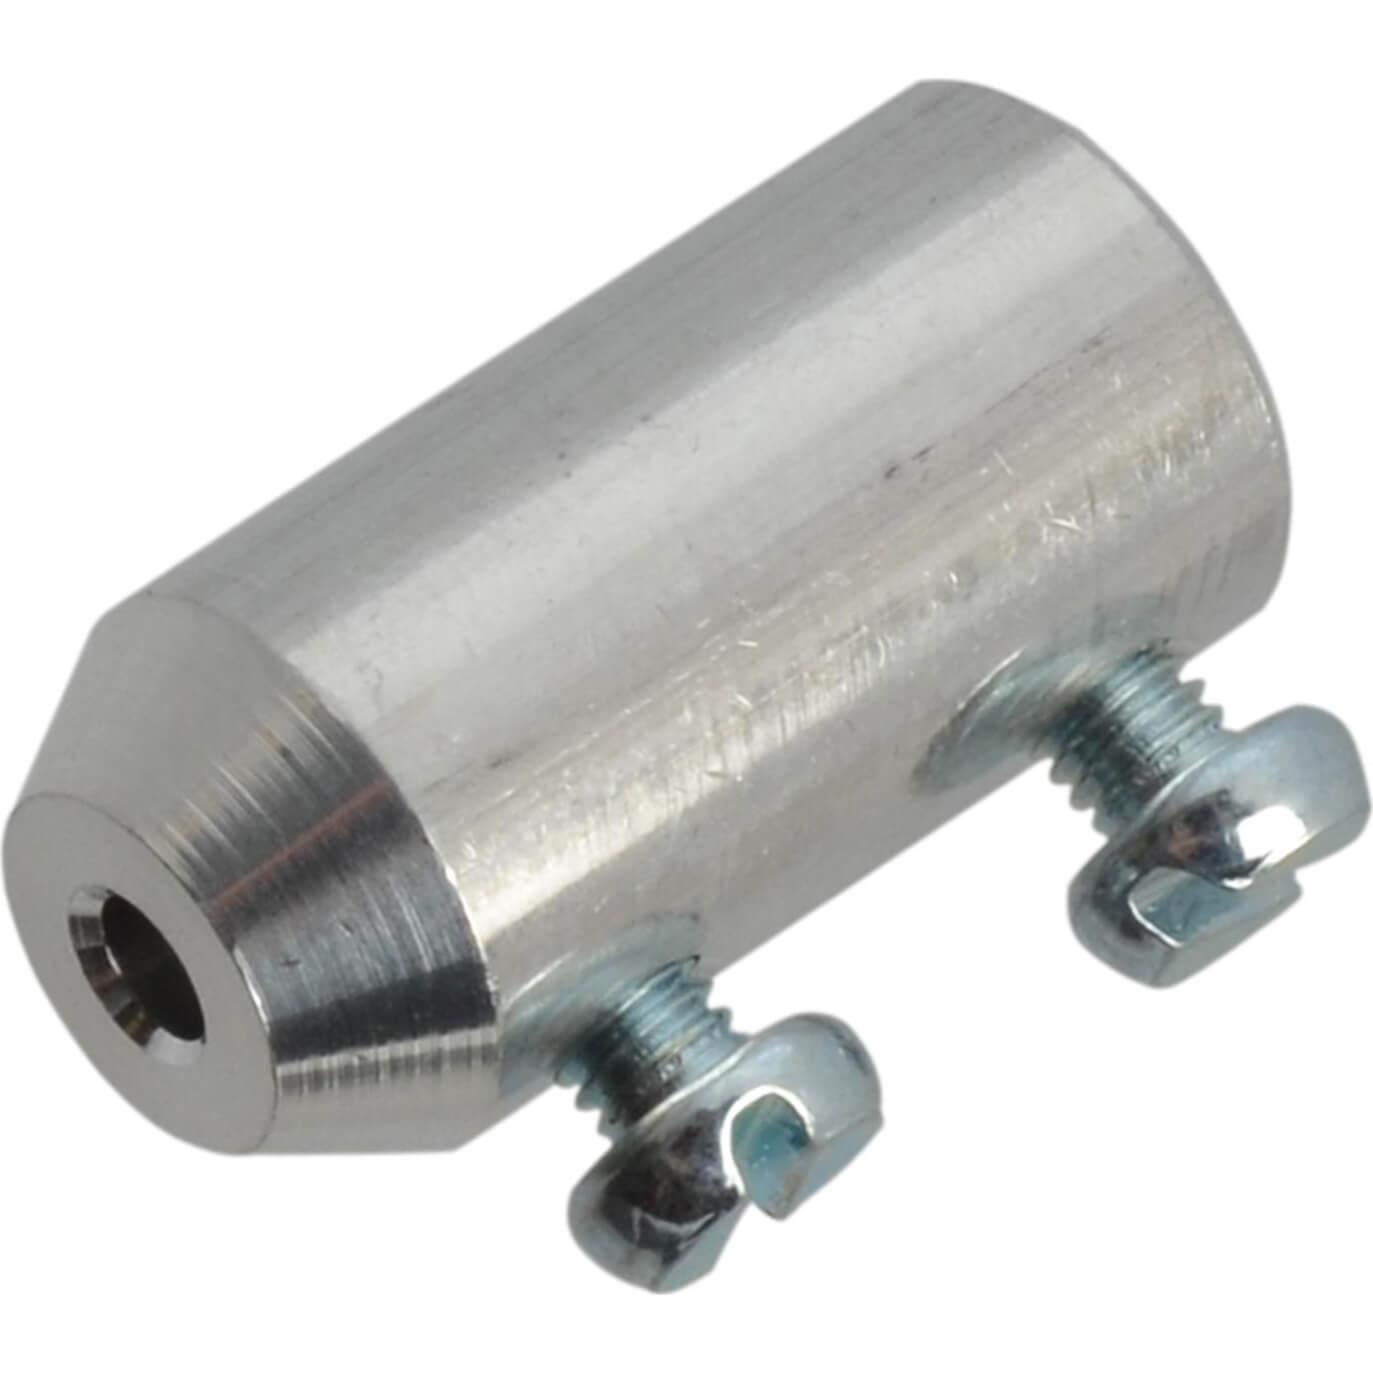 Brennenstuhl Stylus Adaptor 1508130